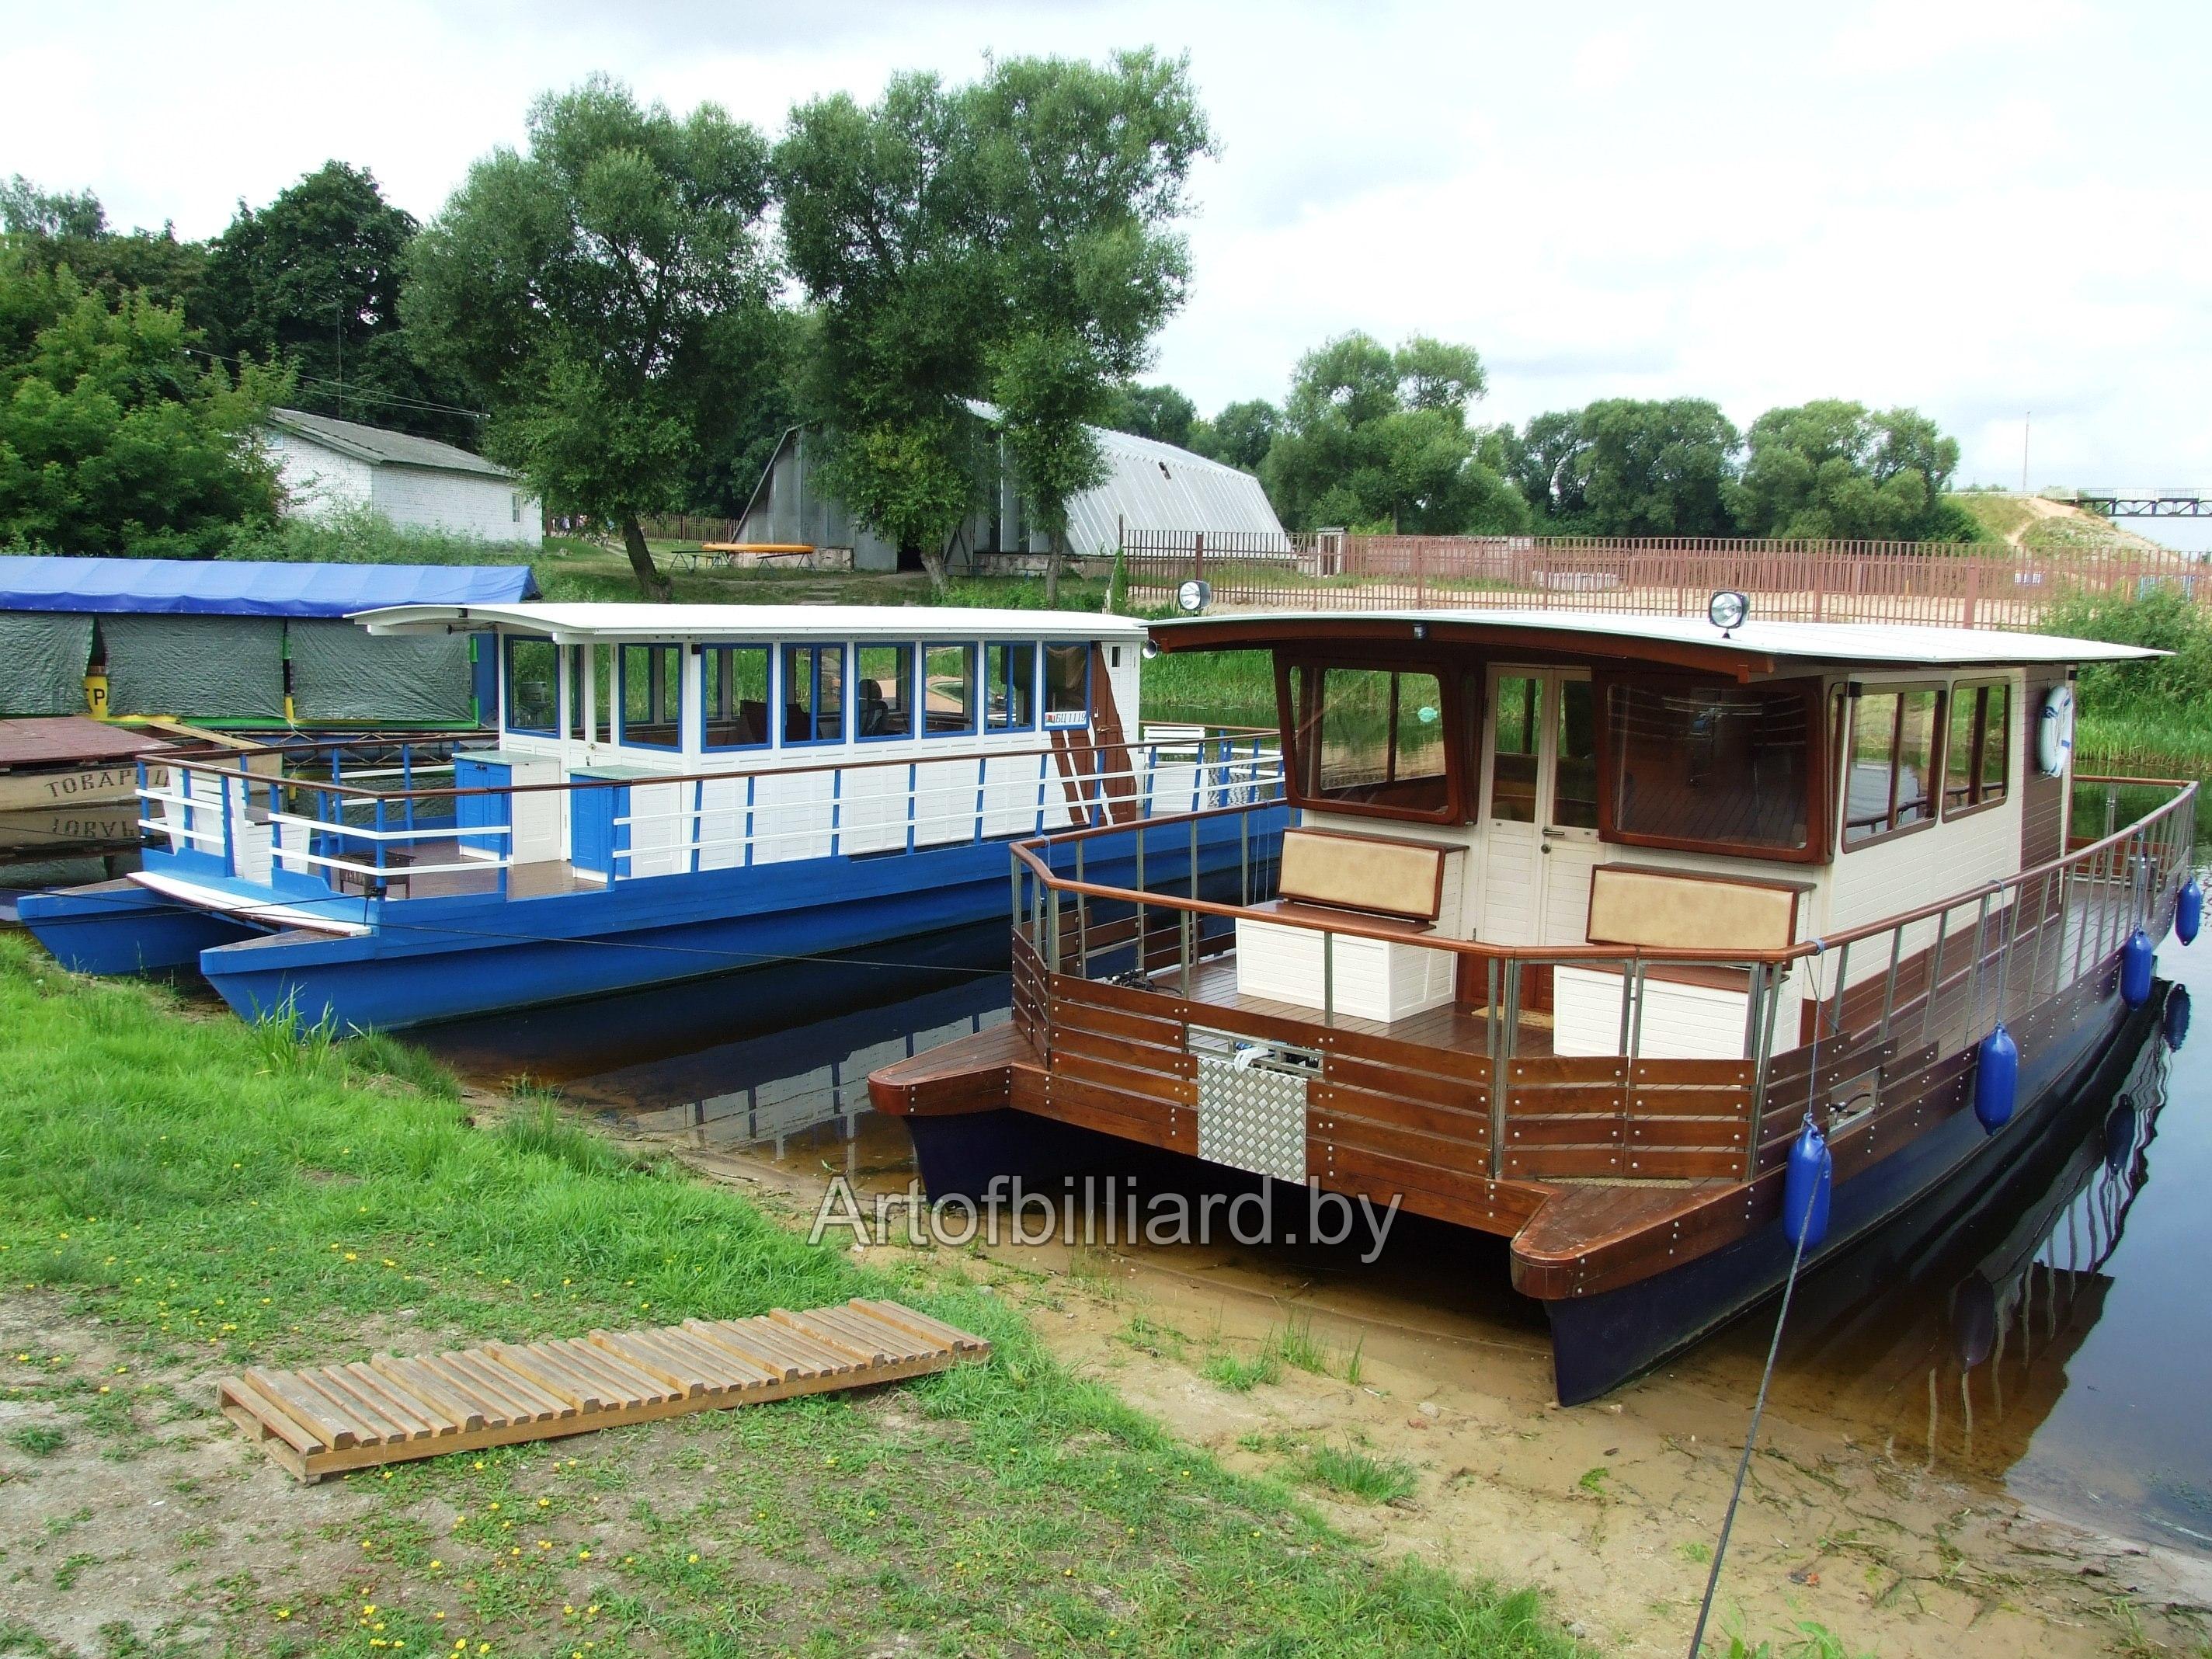 Яхта-катамаран белого и древесного цвета